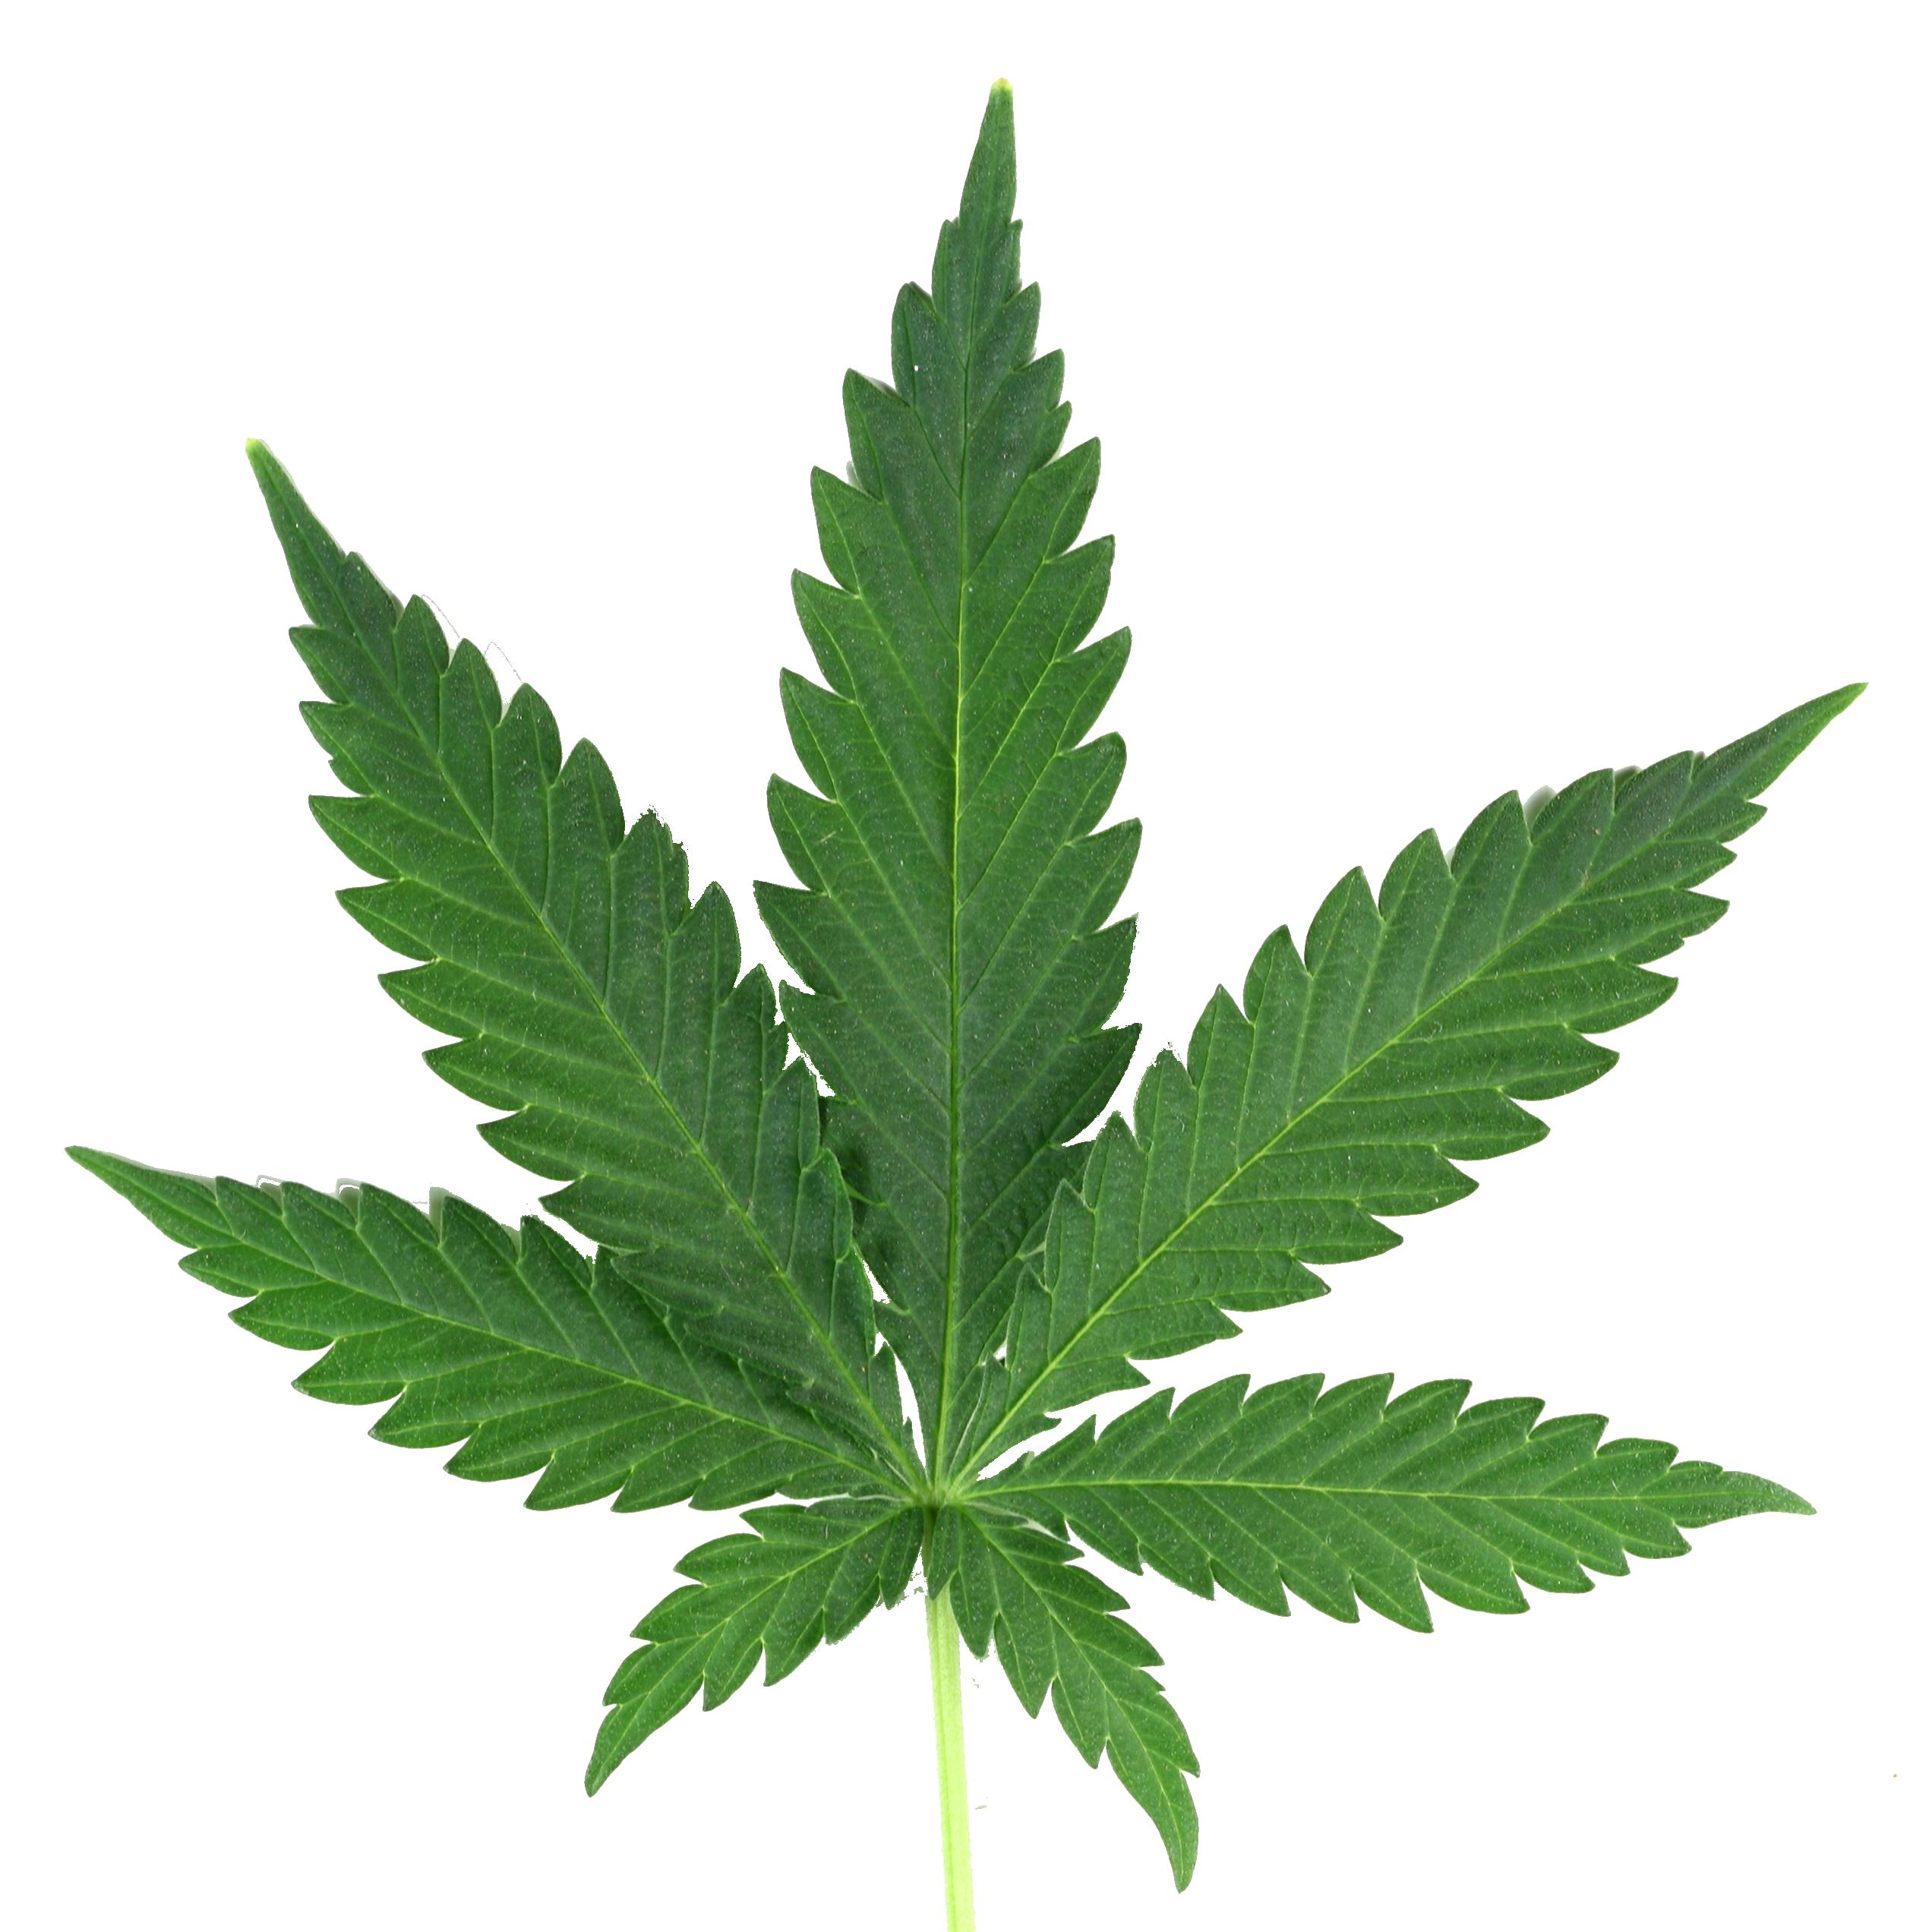 Weed PNG Image